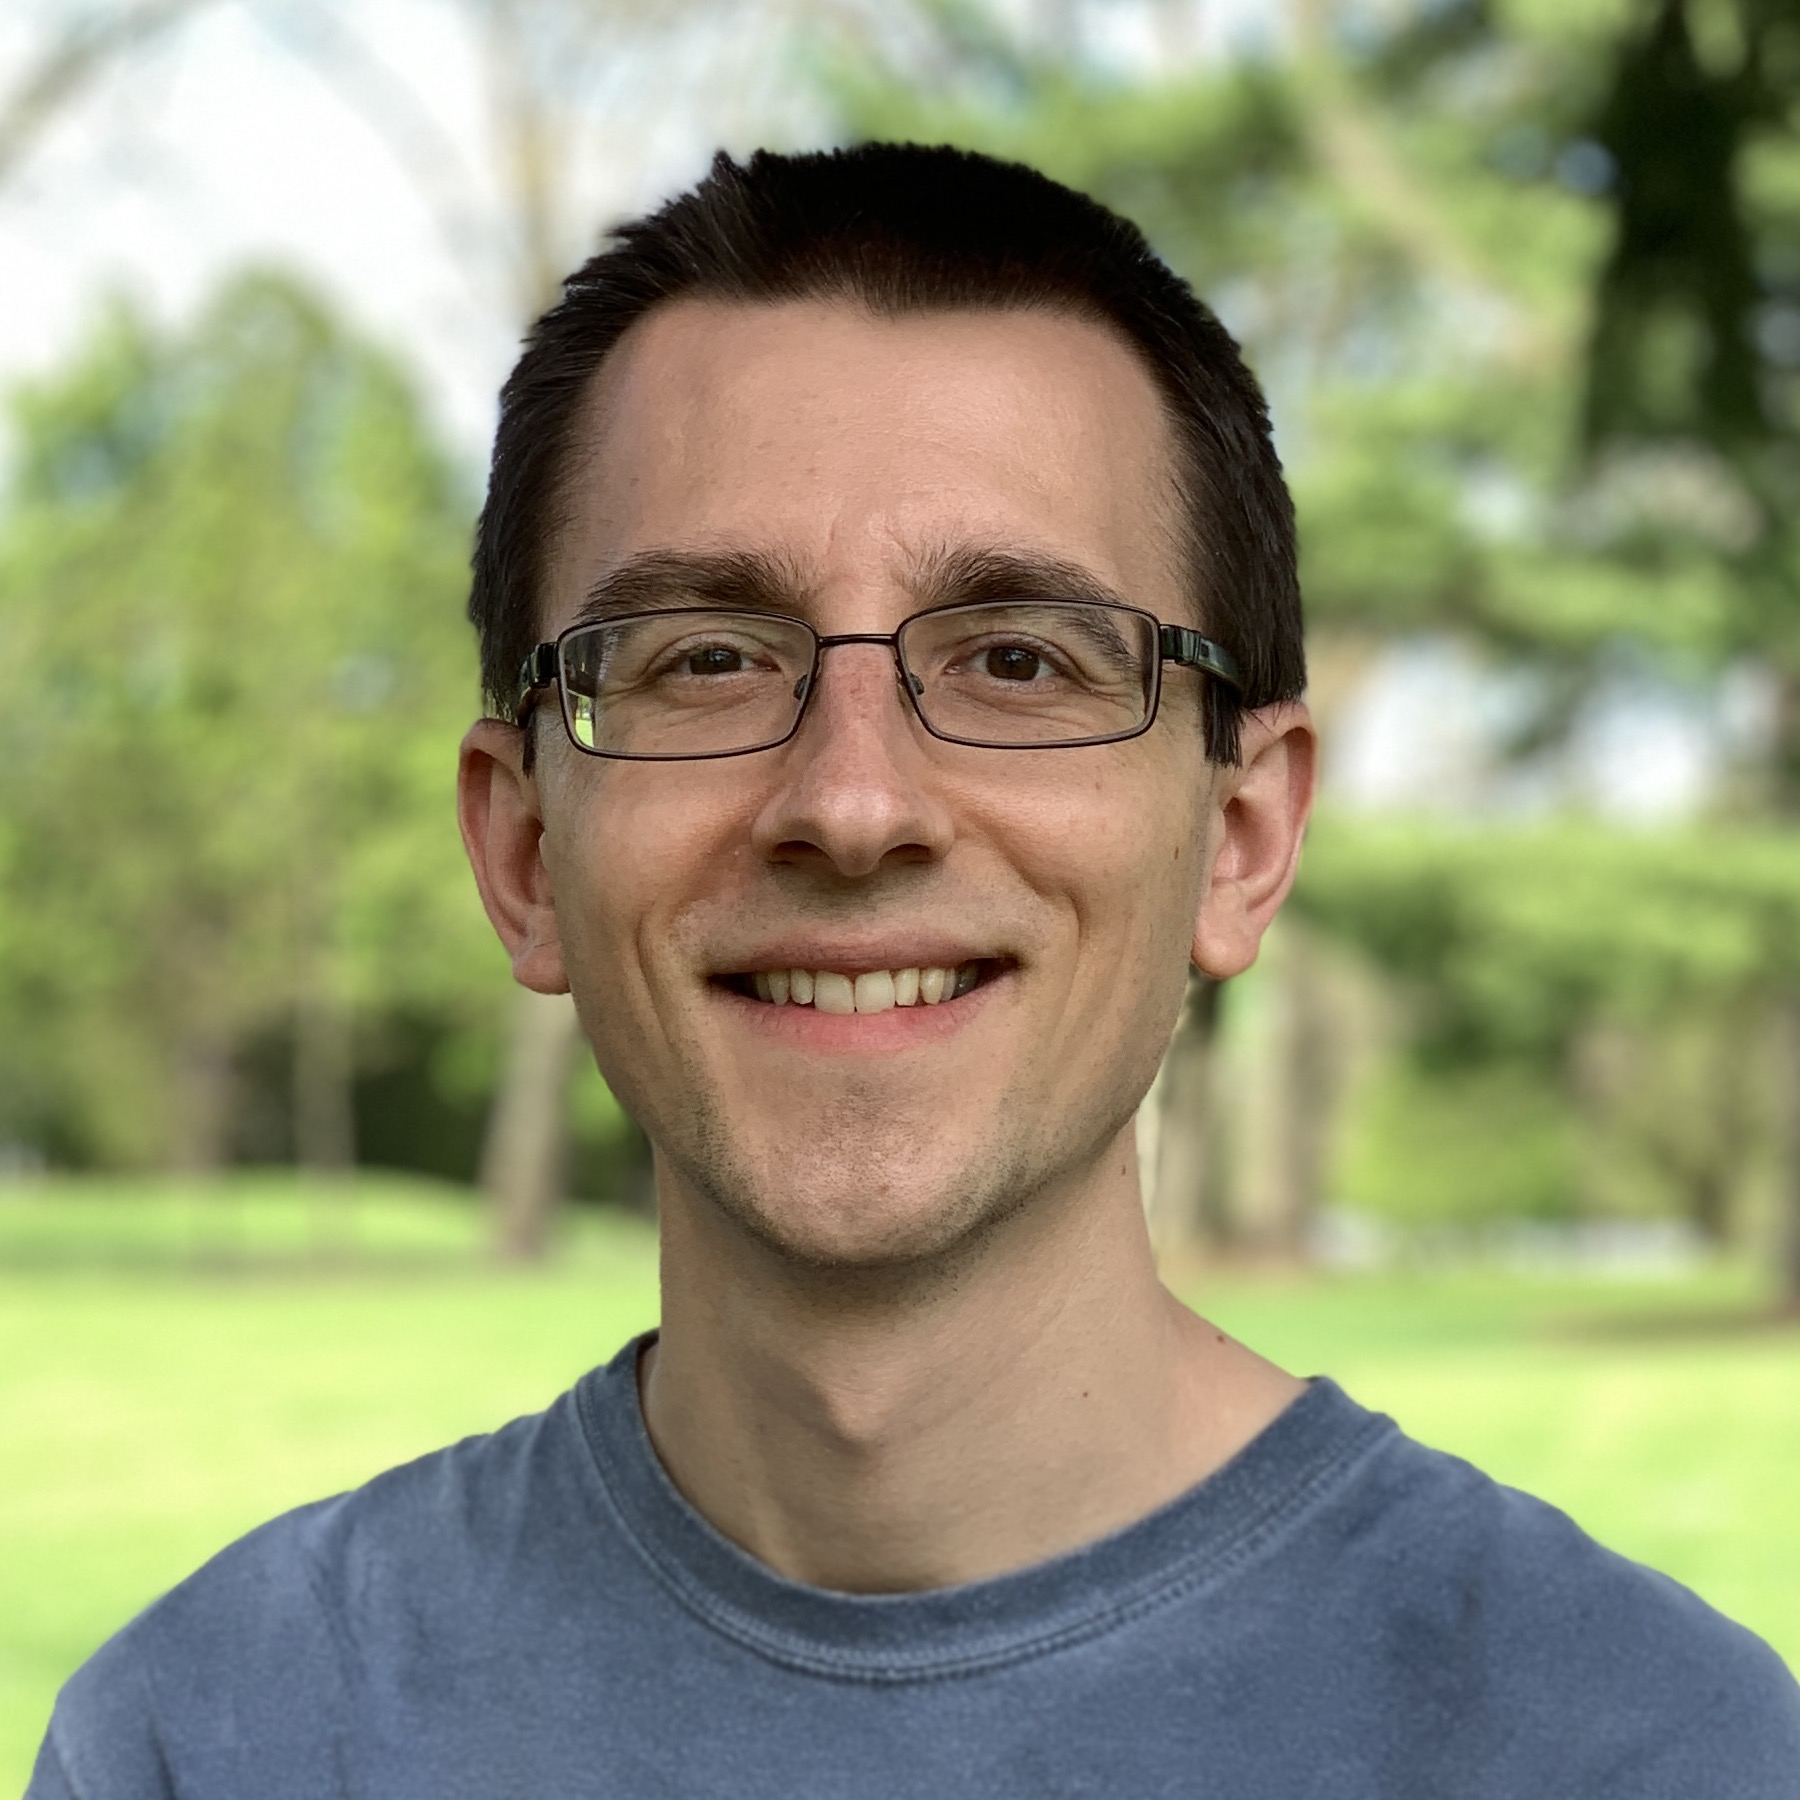 Aaron Gember-Jacobson